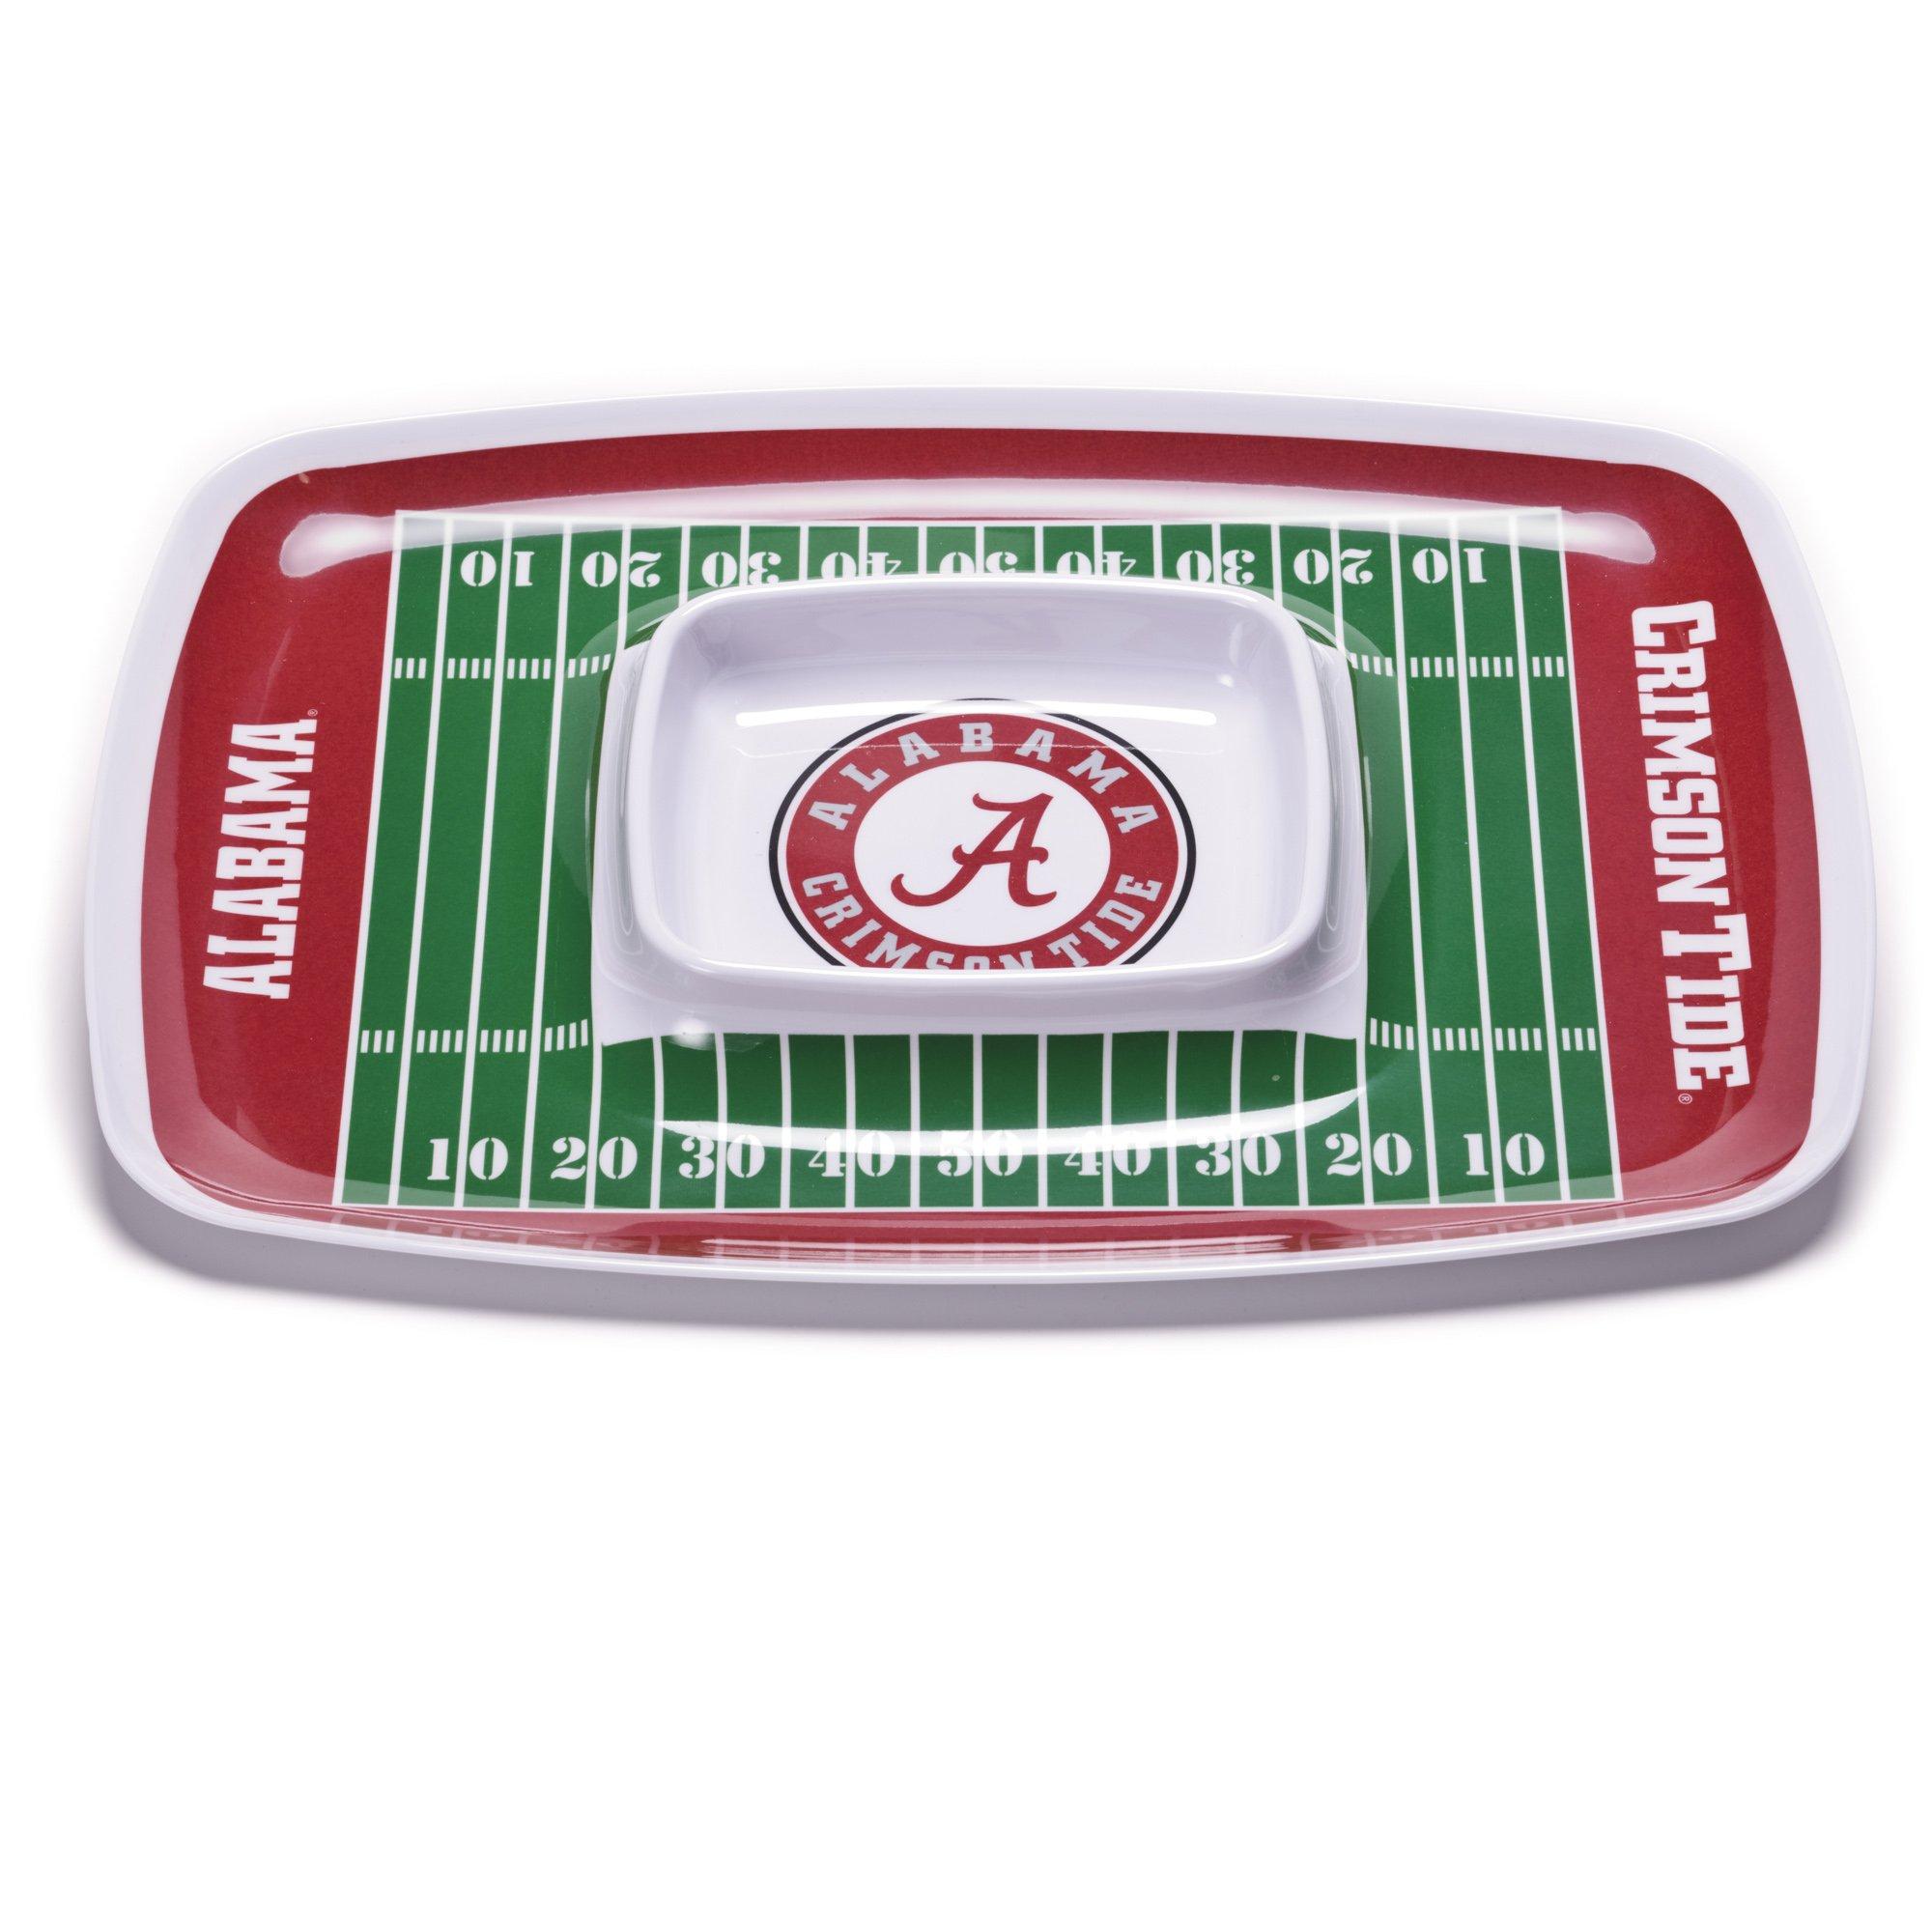 NCAA Alabama Crimson Tide Melamine Chip and Dip Tray